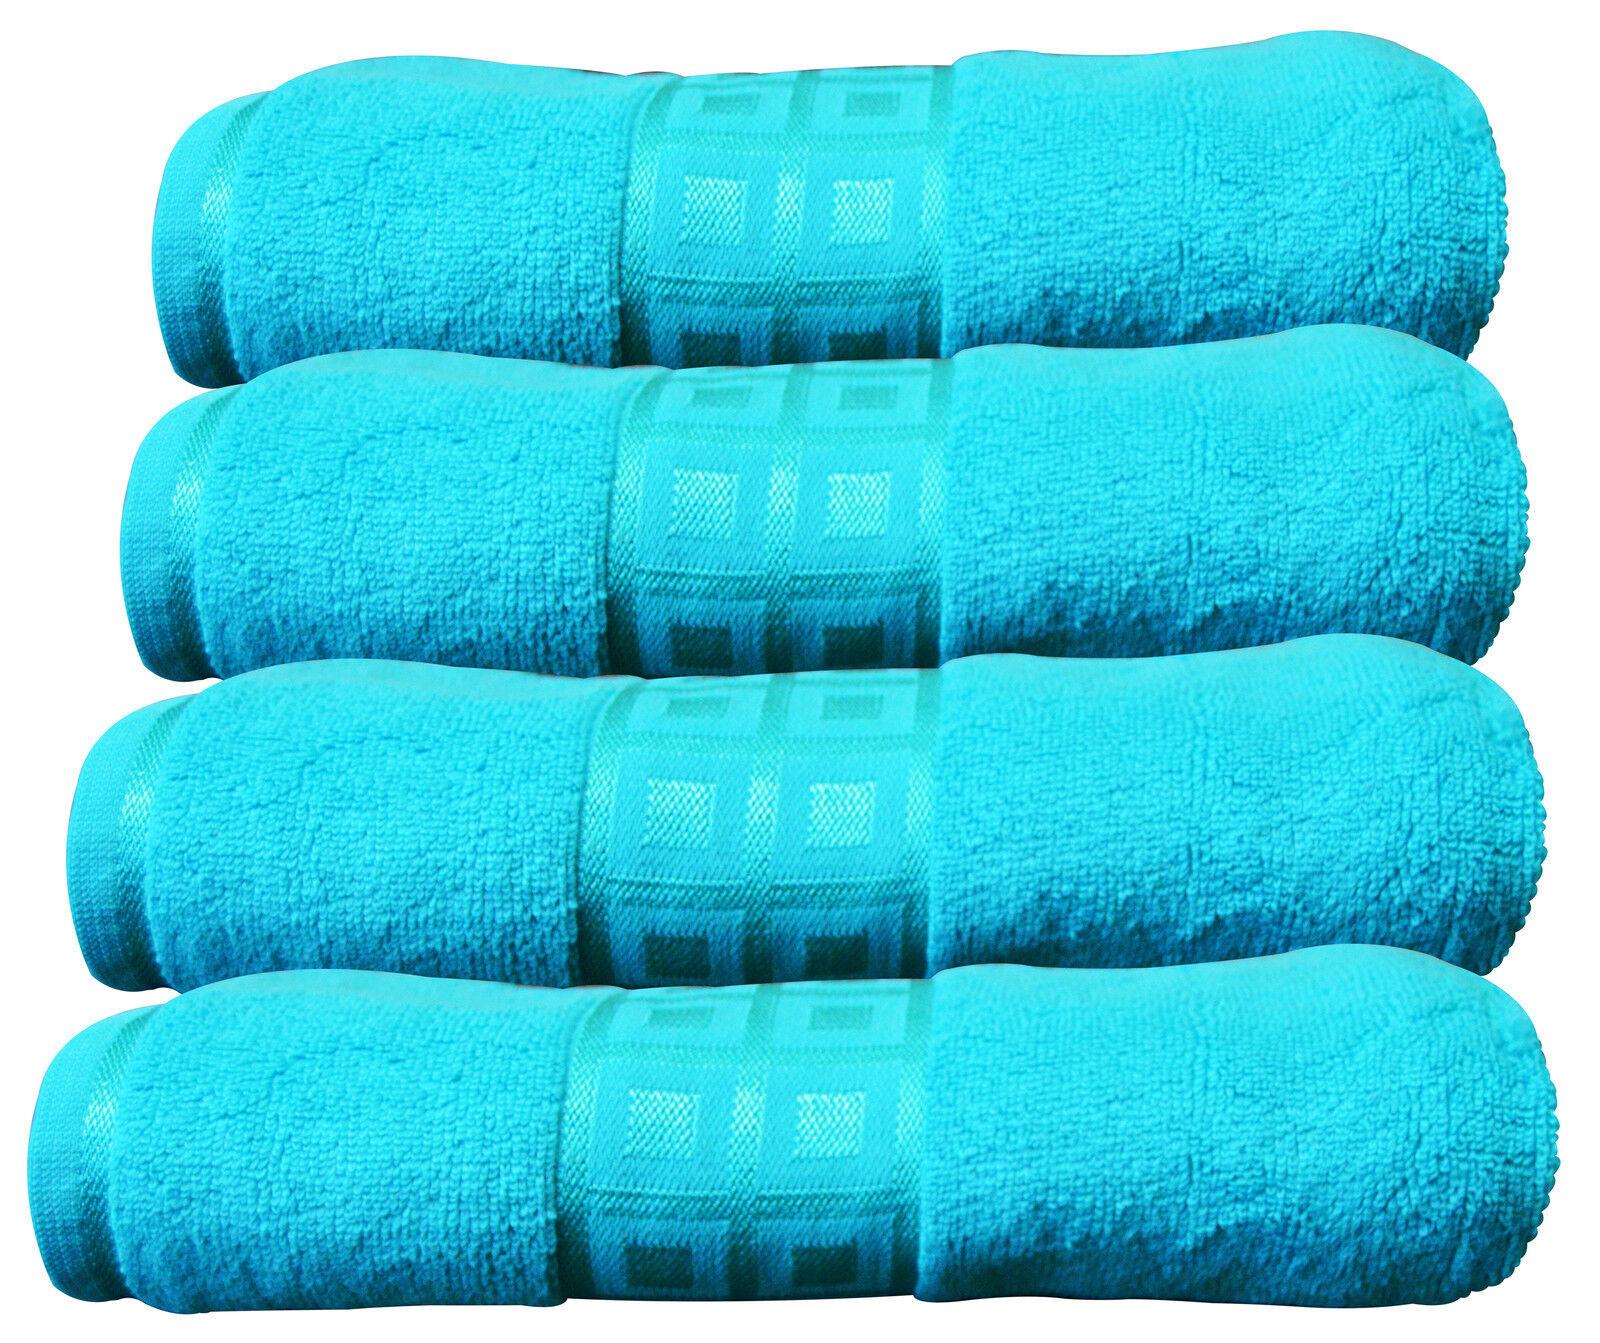 Guest Towels Ebay: Zero Twist Cotton Bath Towel Set Zero-Twist Guest Towel